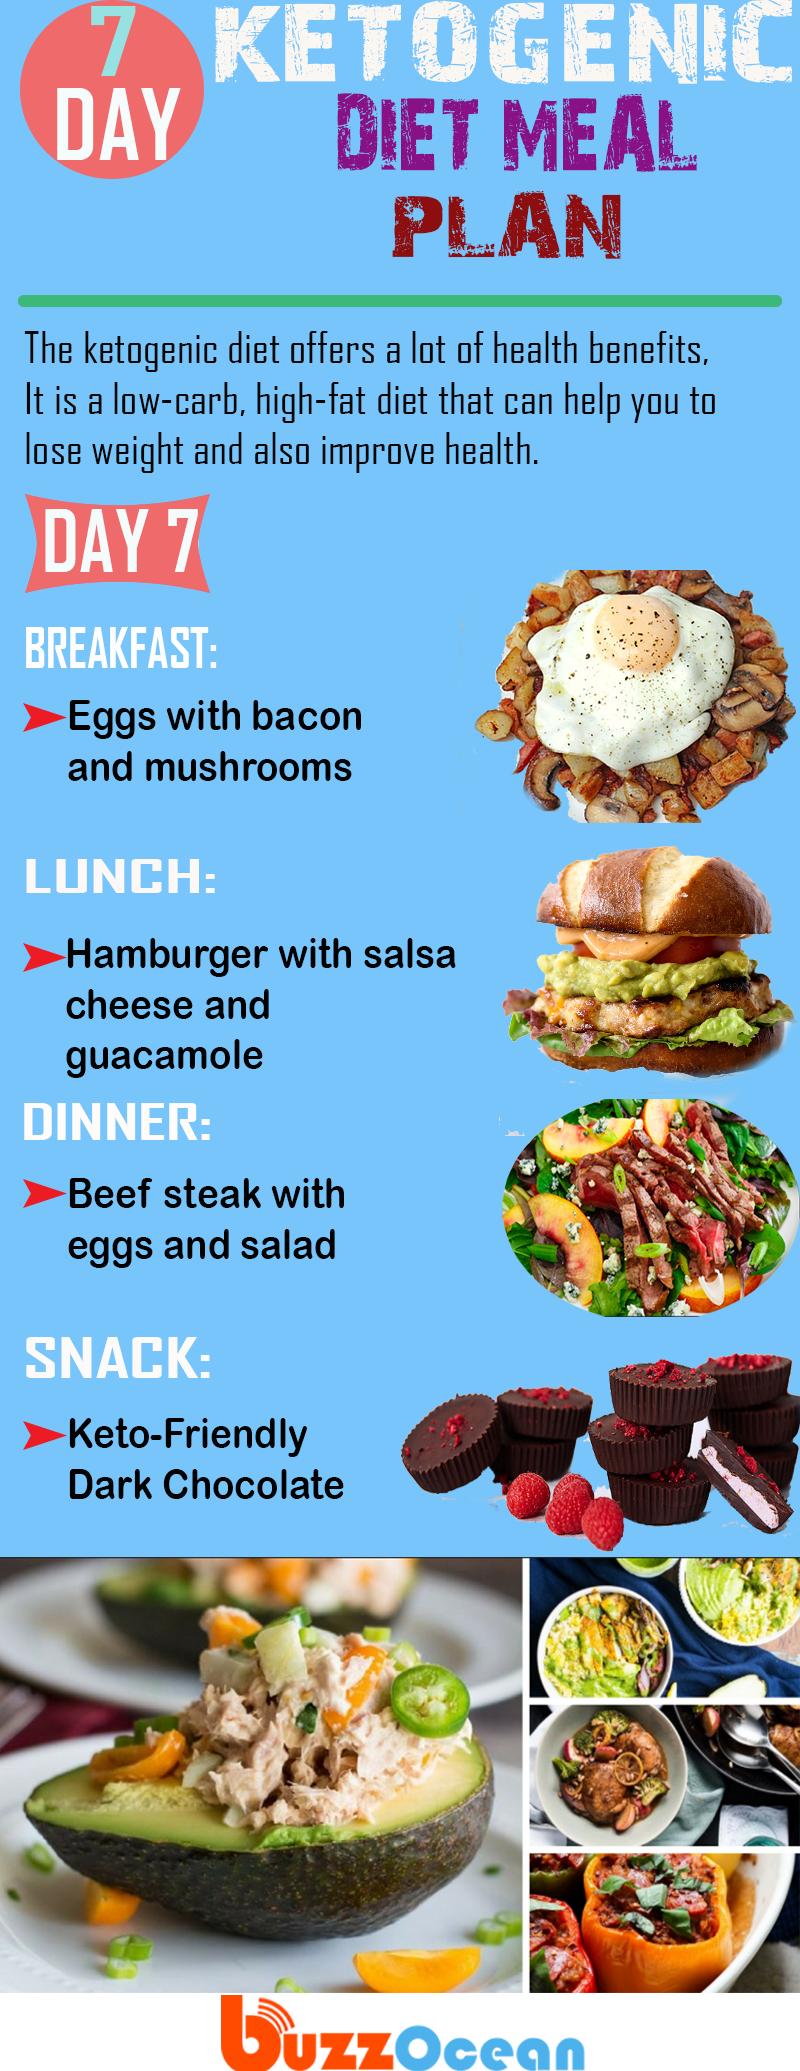 Keto Diet 7 Day Ketogenic Diet Meal Plan Keto meal plan